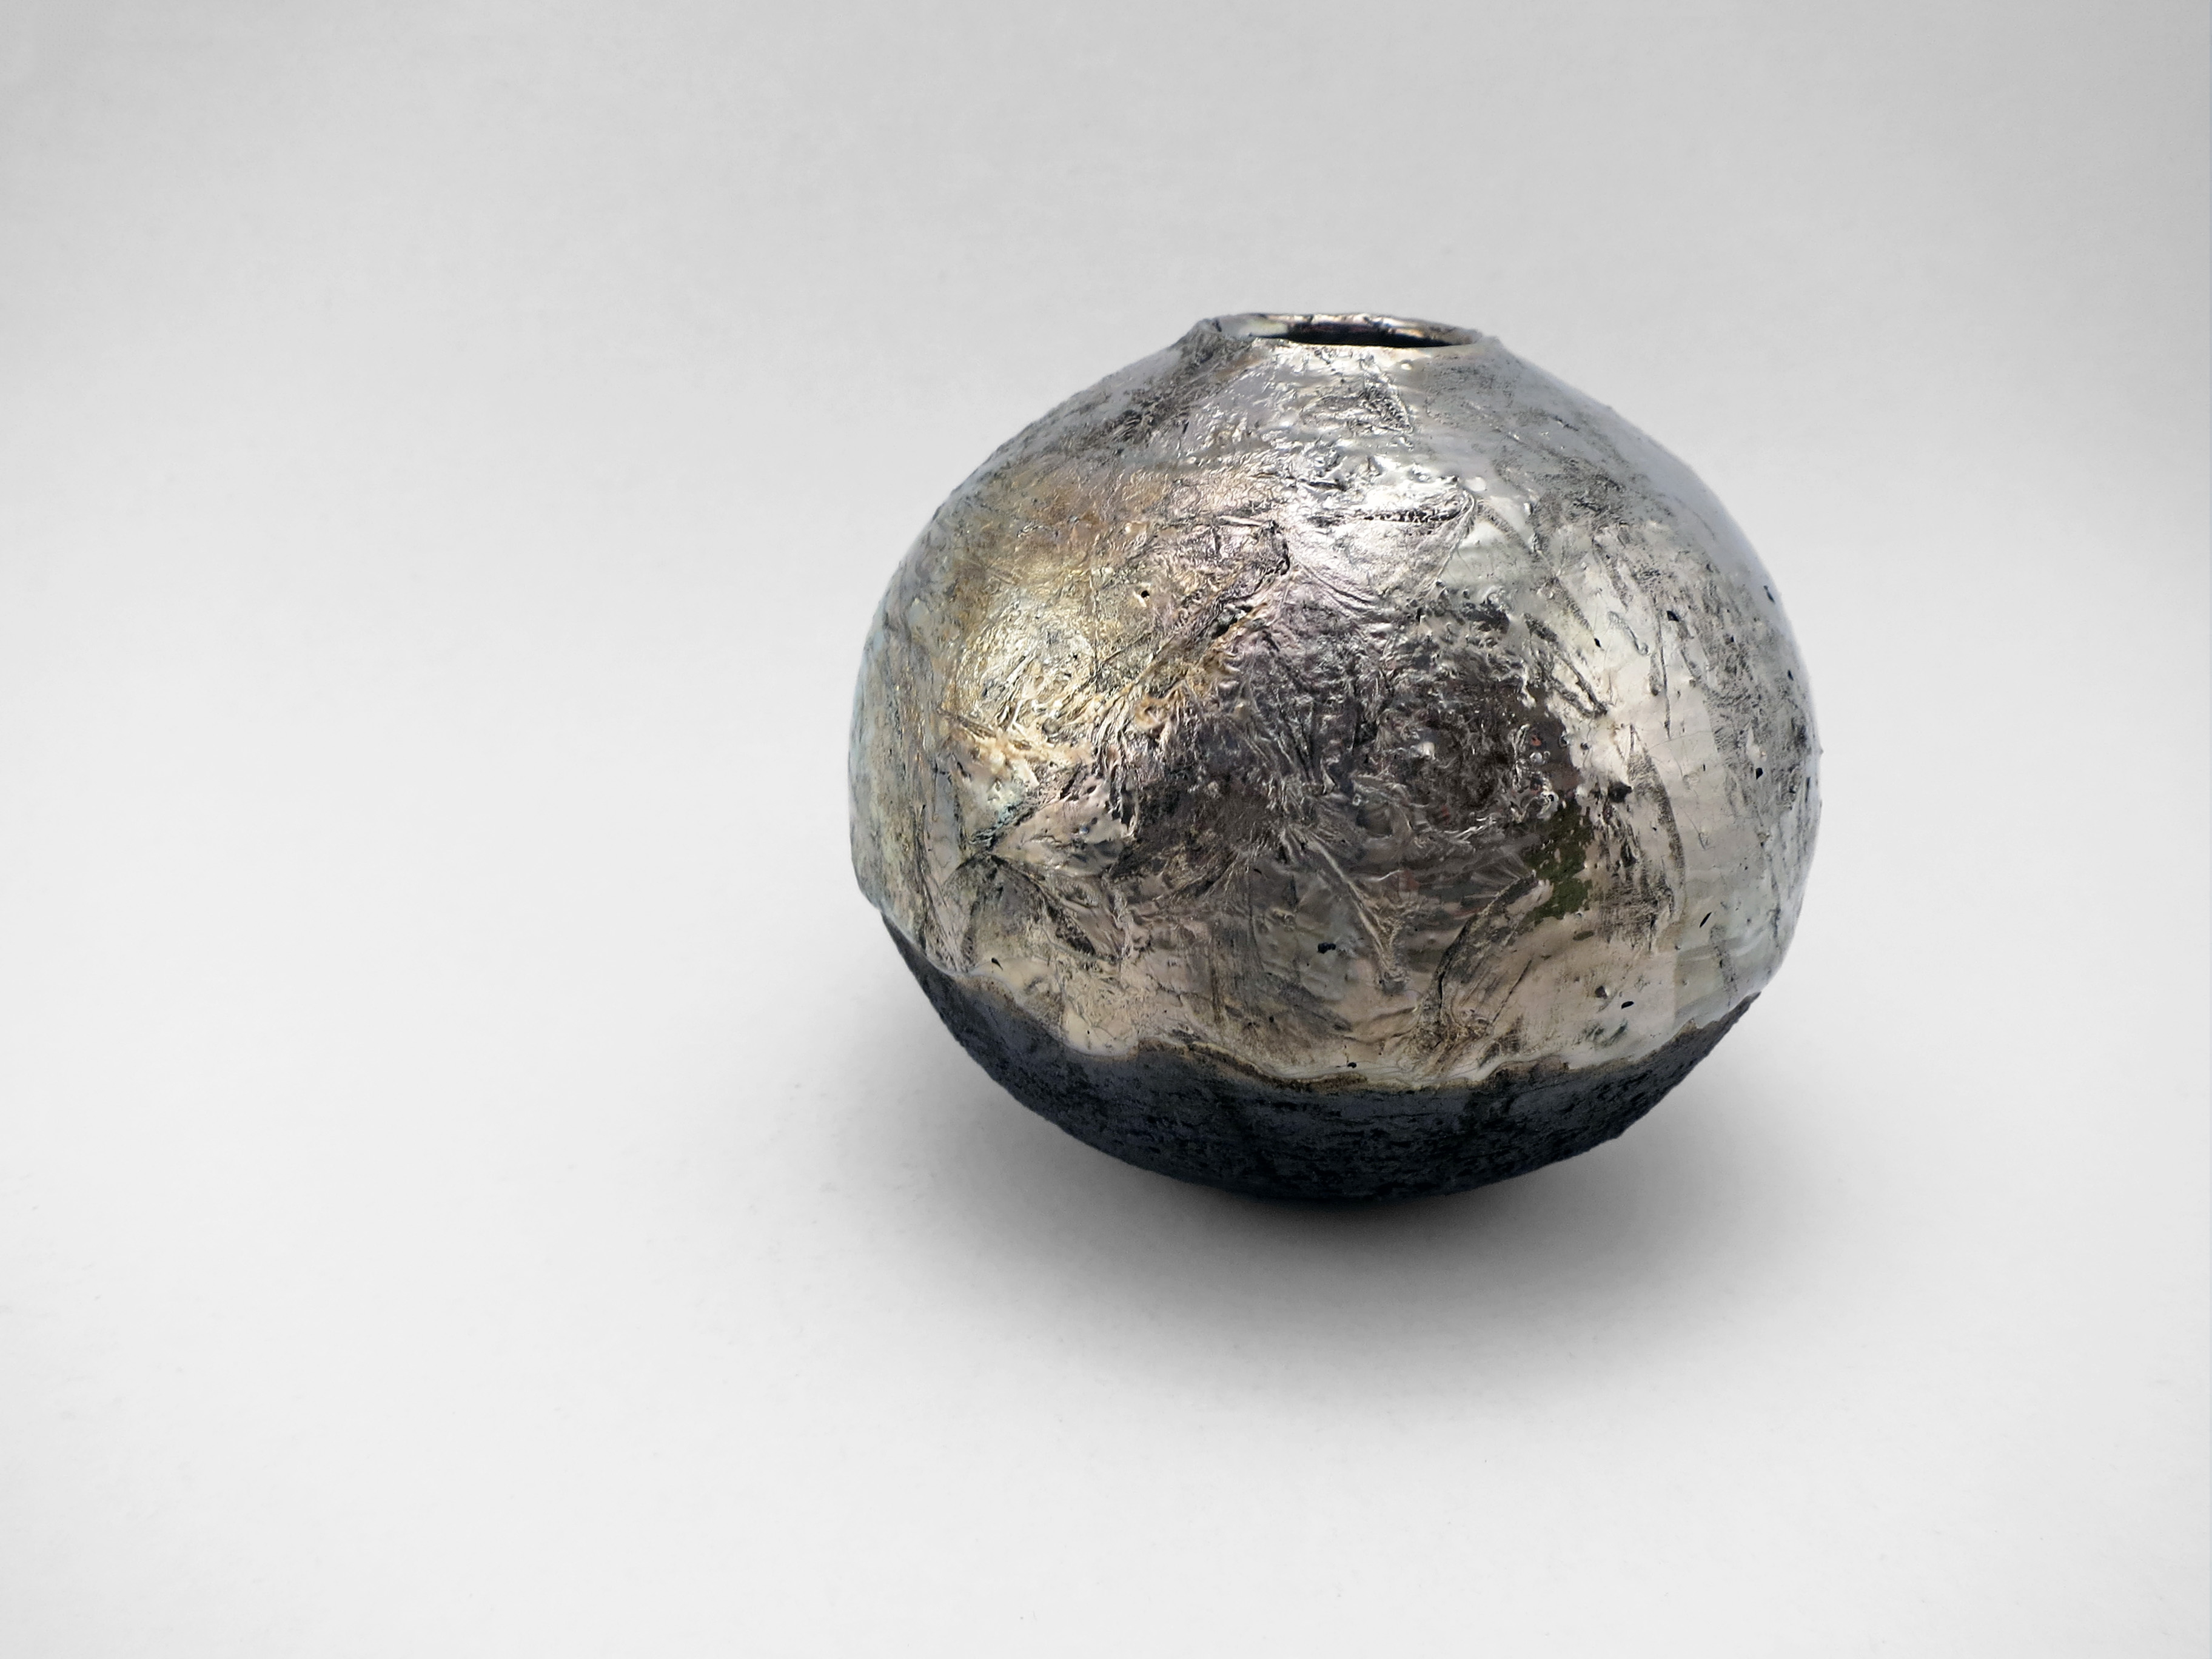 Weird Terrain on Mercury: Whispering Globe - Ildikó Károlyi